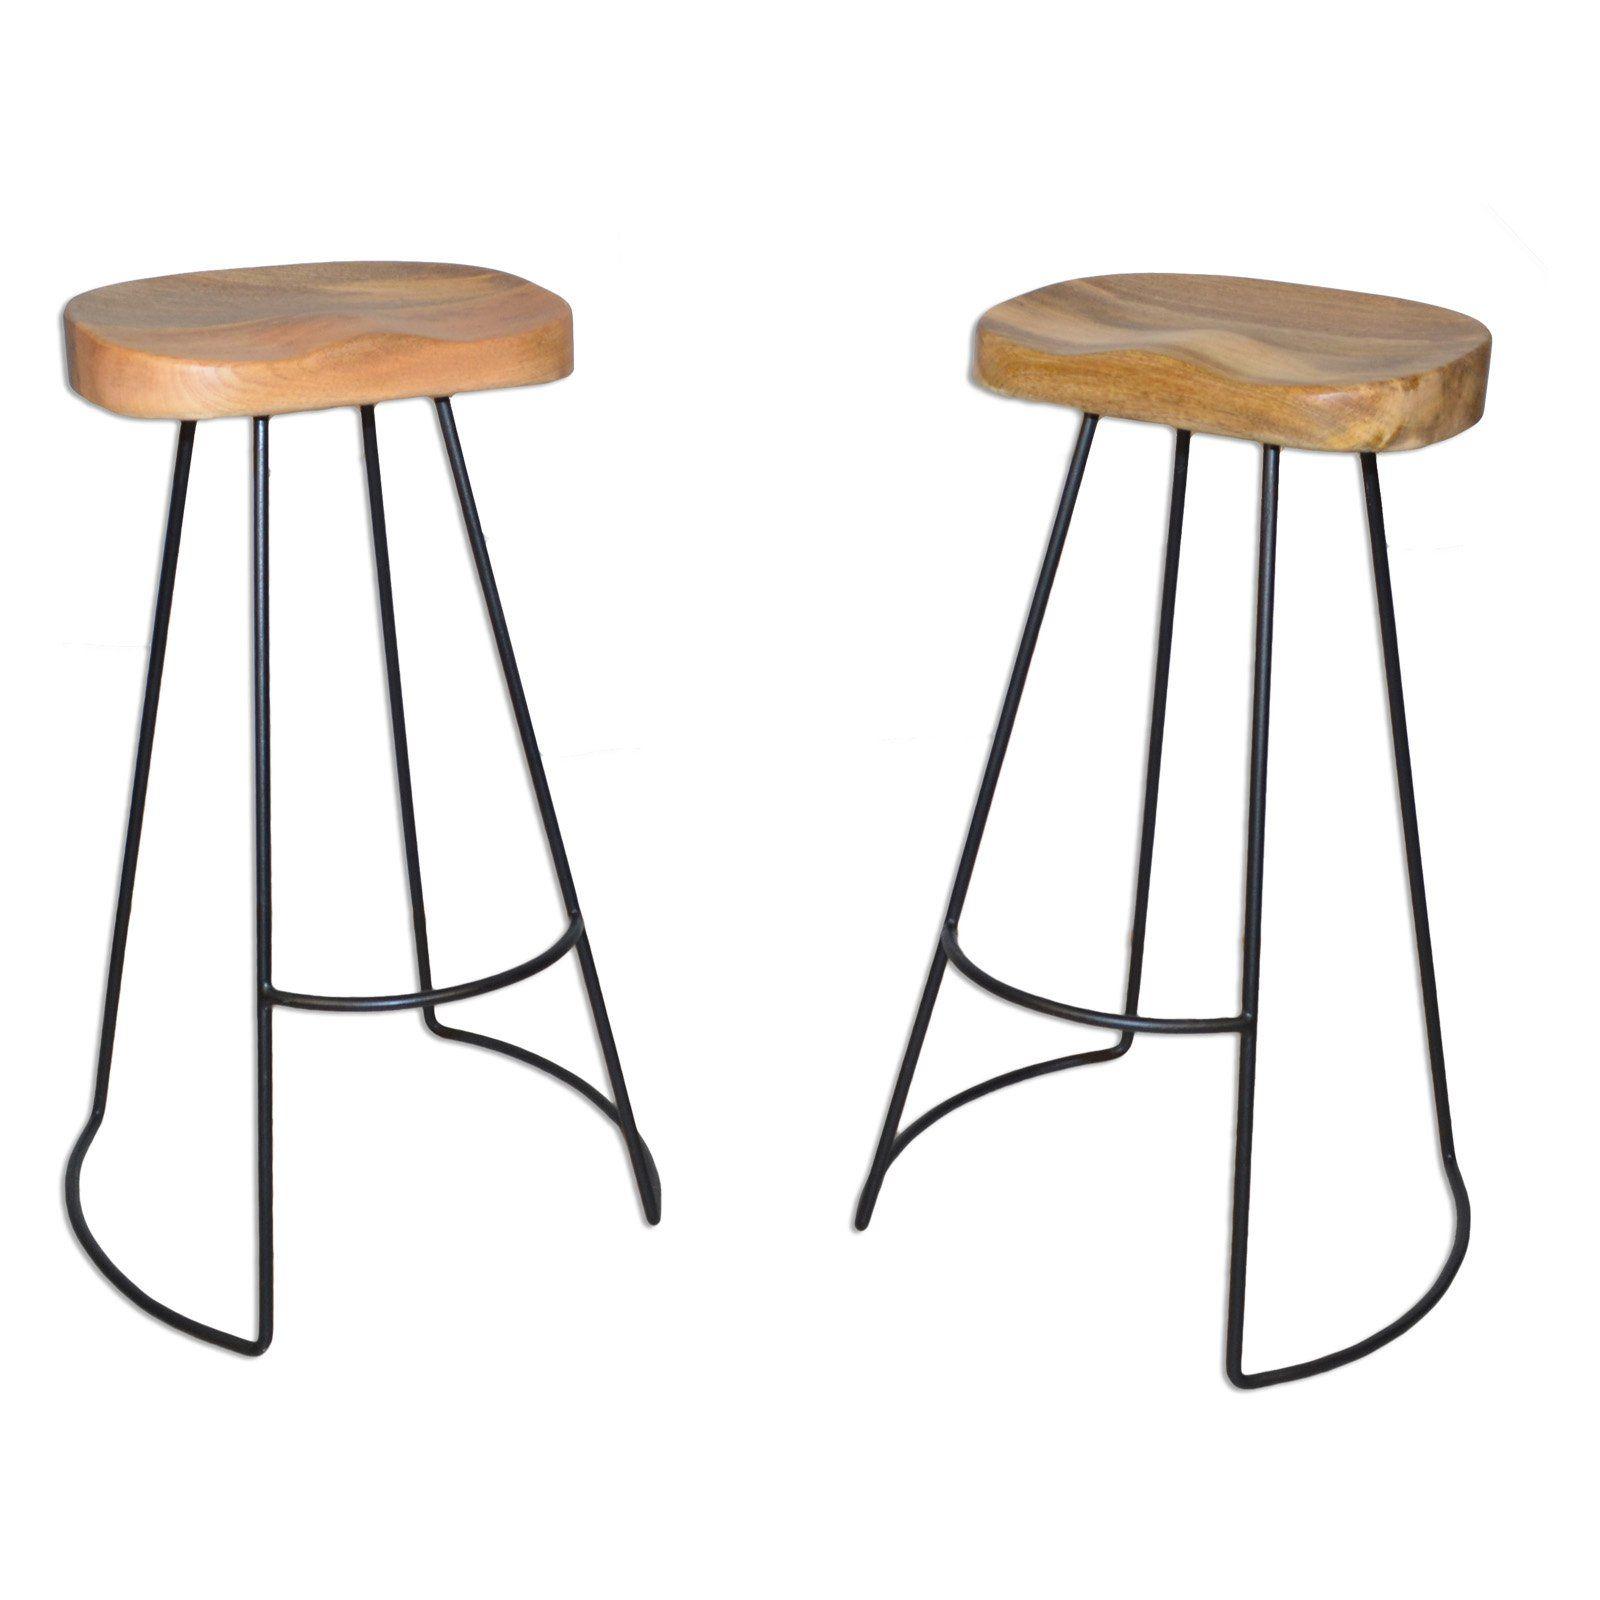 Carolina Chair Table Co Sadie 31 In Backless Bar Stool Set